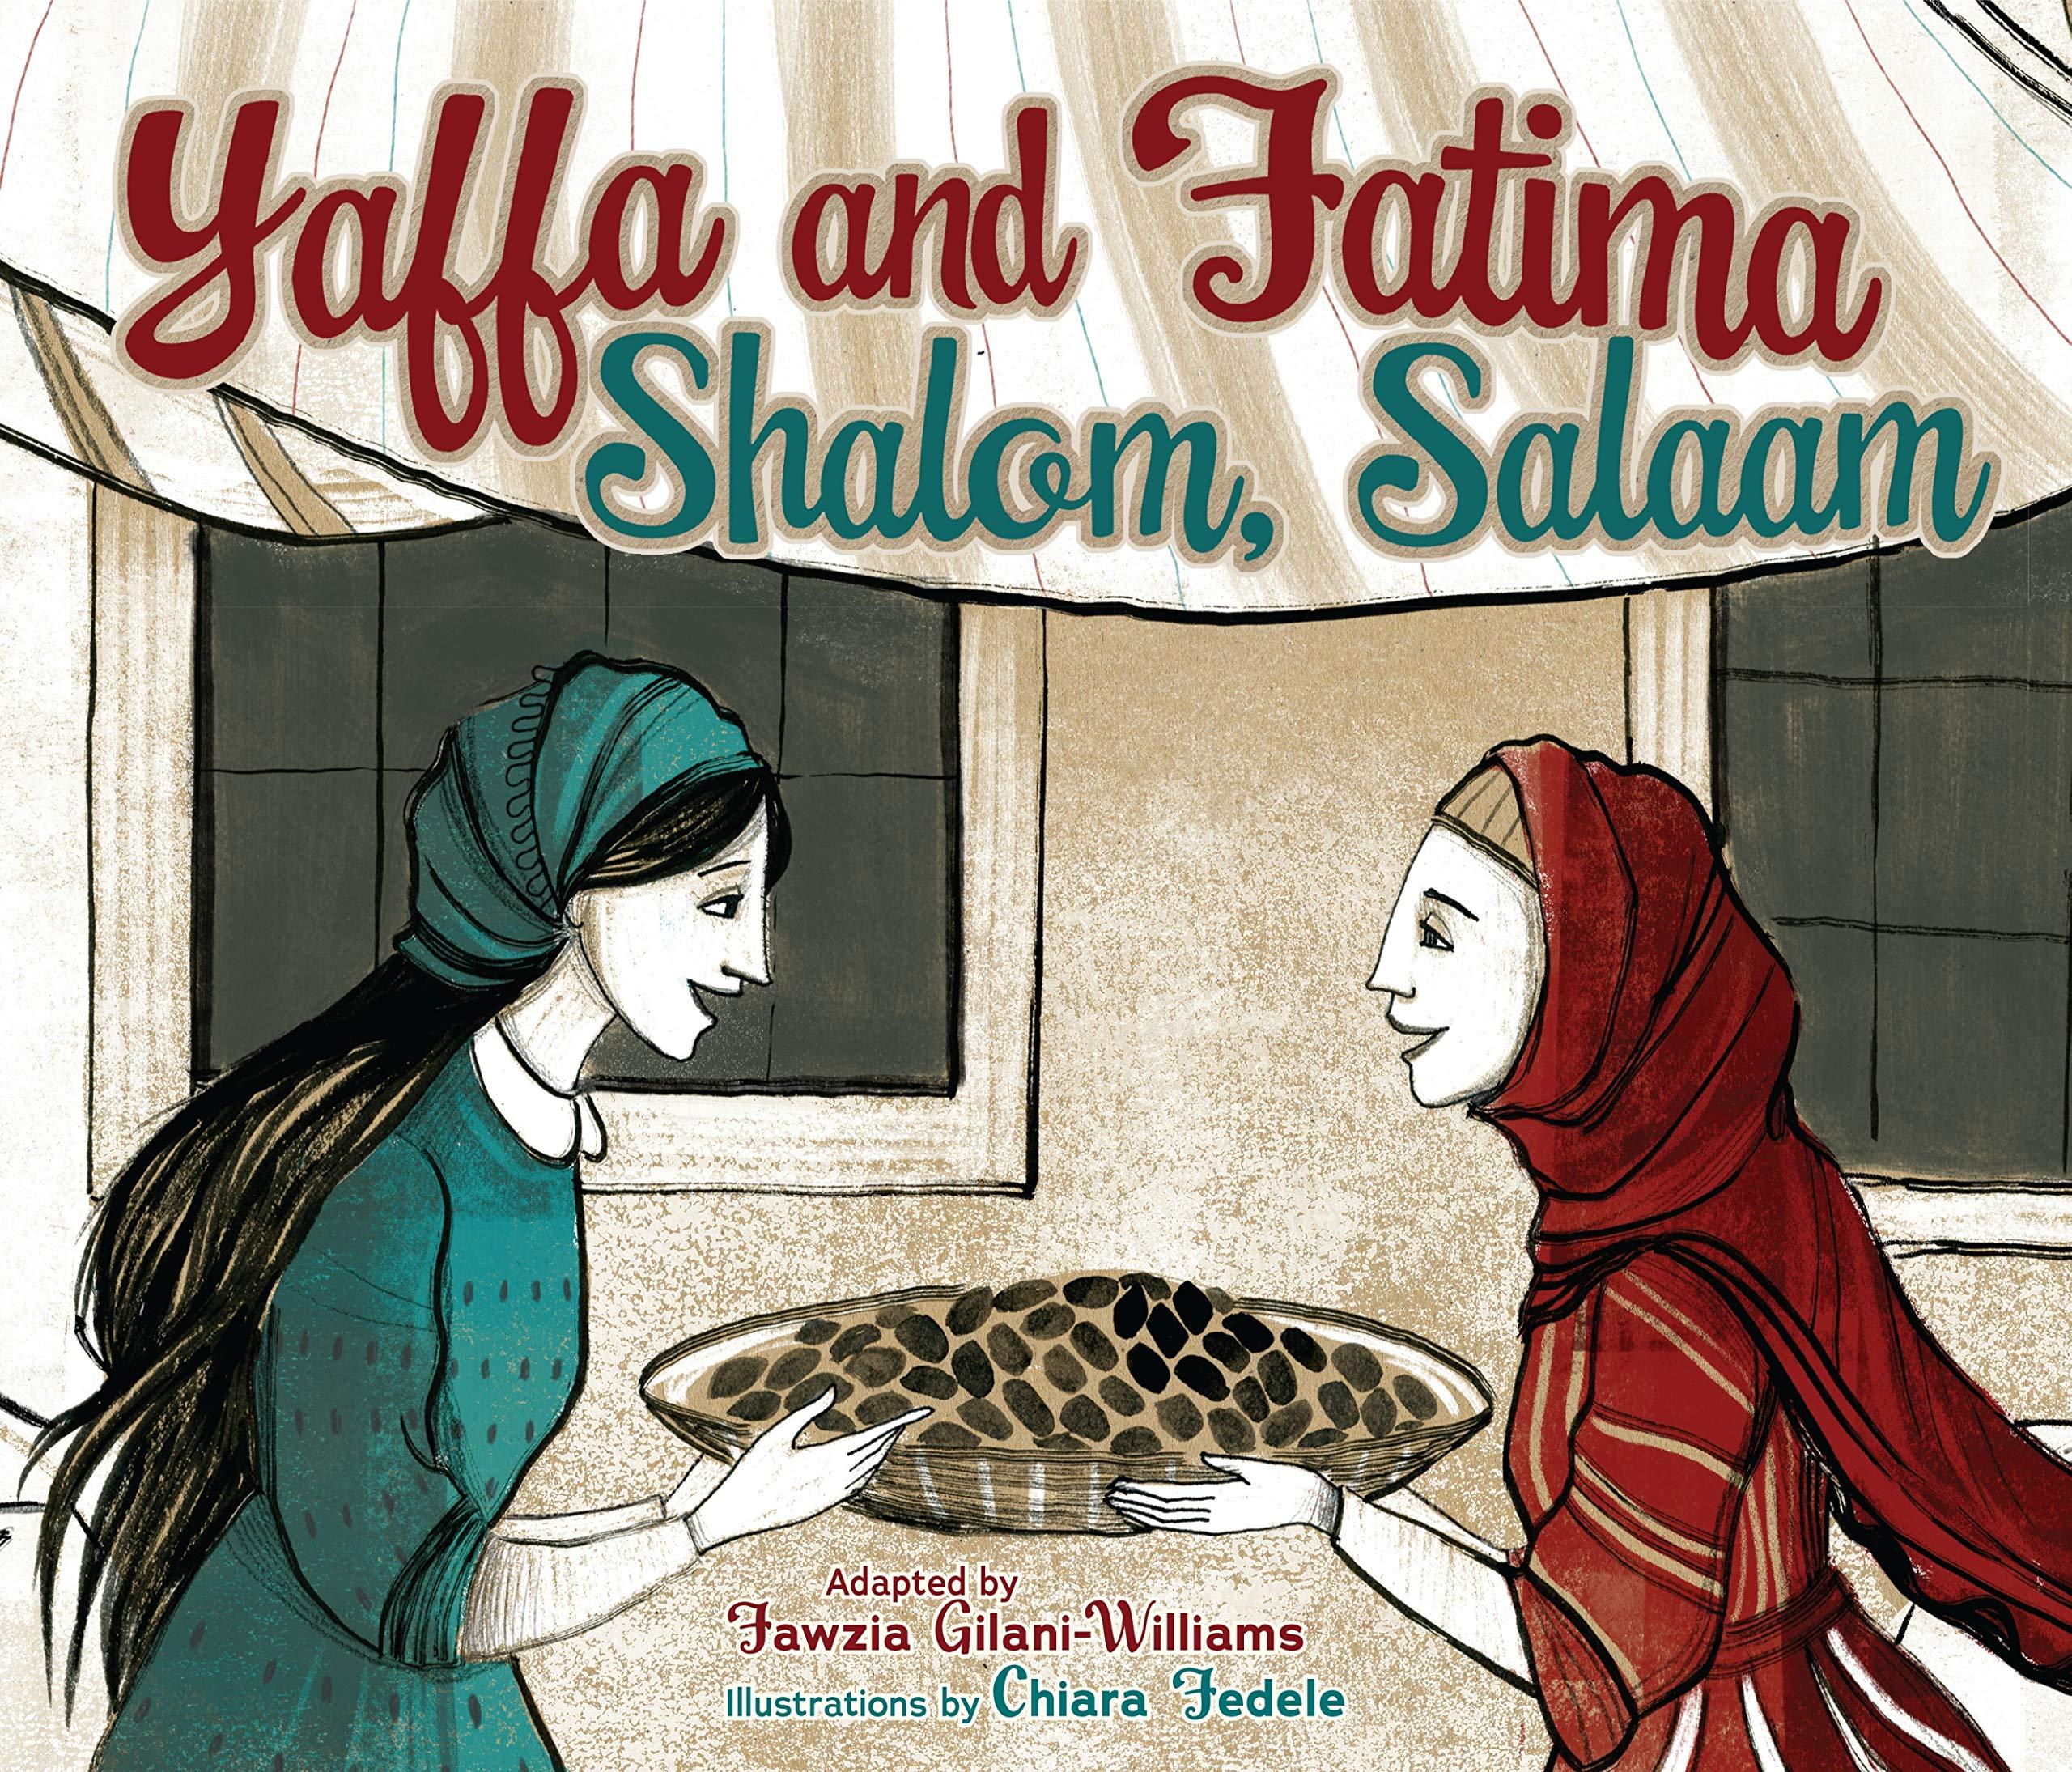 Yaffa and Fatima Shalom Salaam